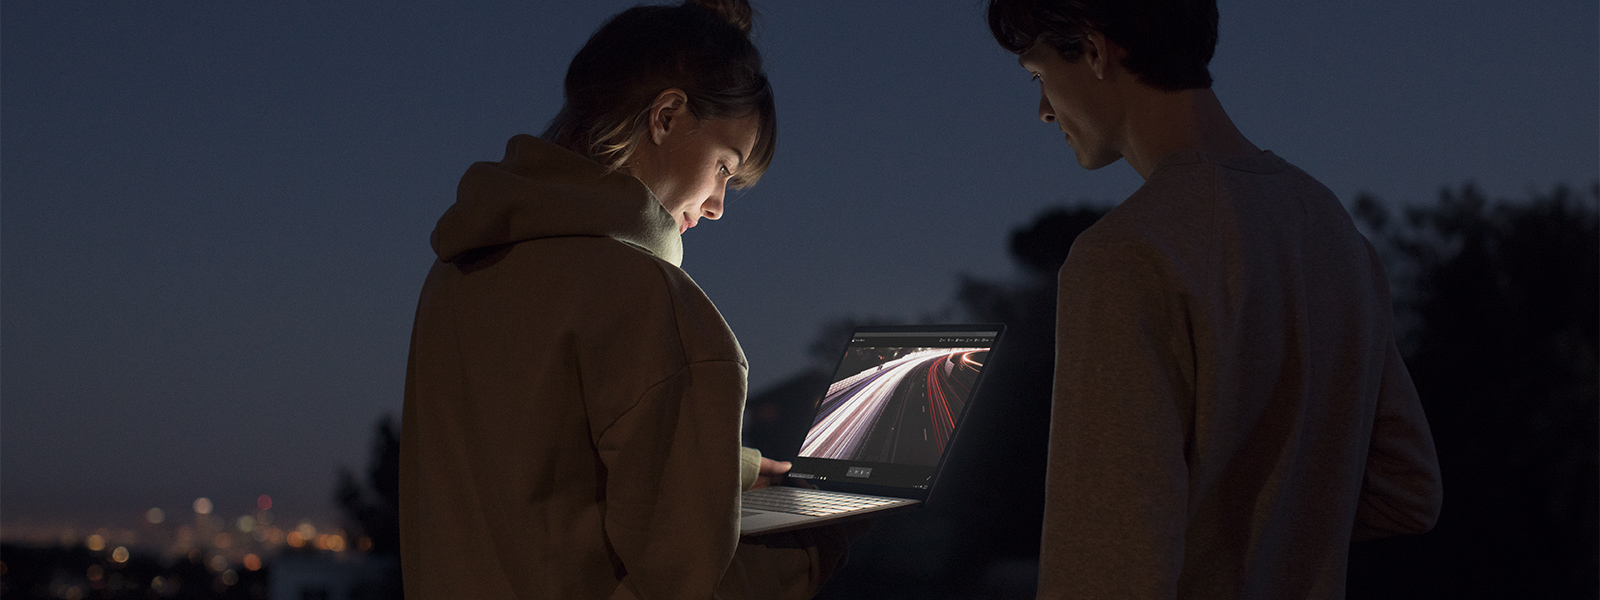 Surface の PixelSense™ を眺めている男性と女声